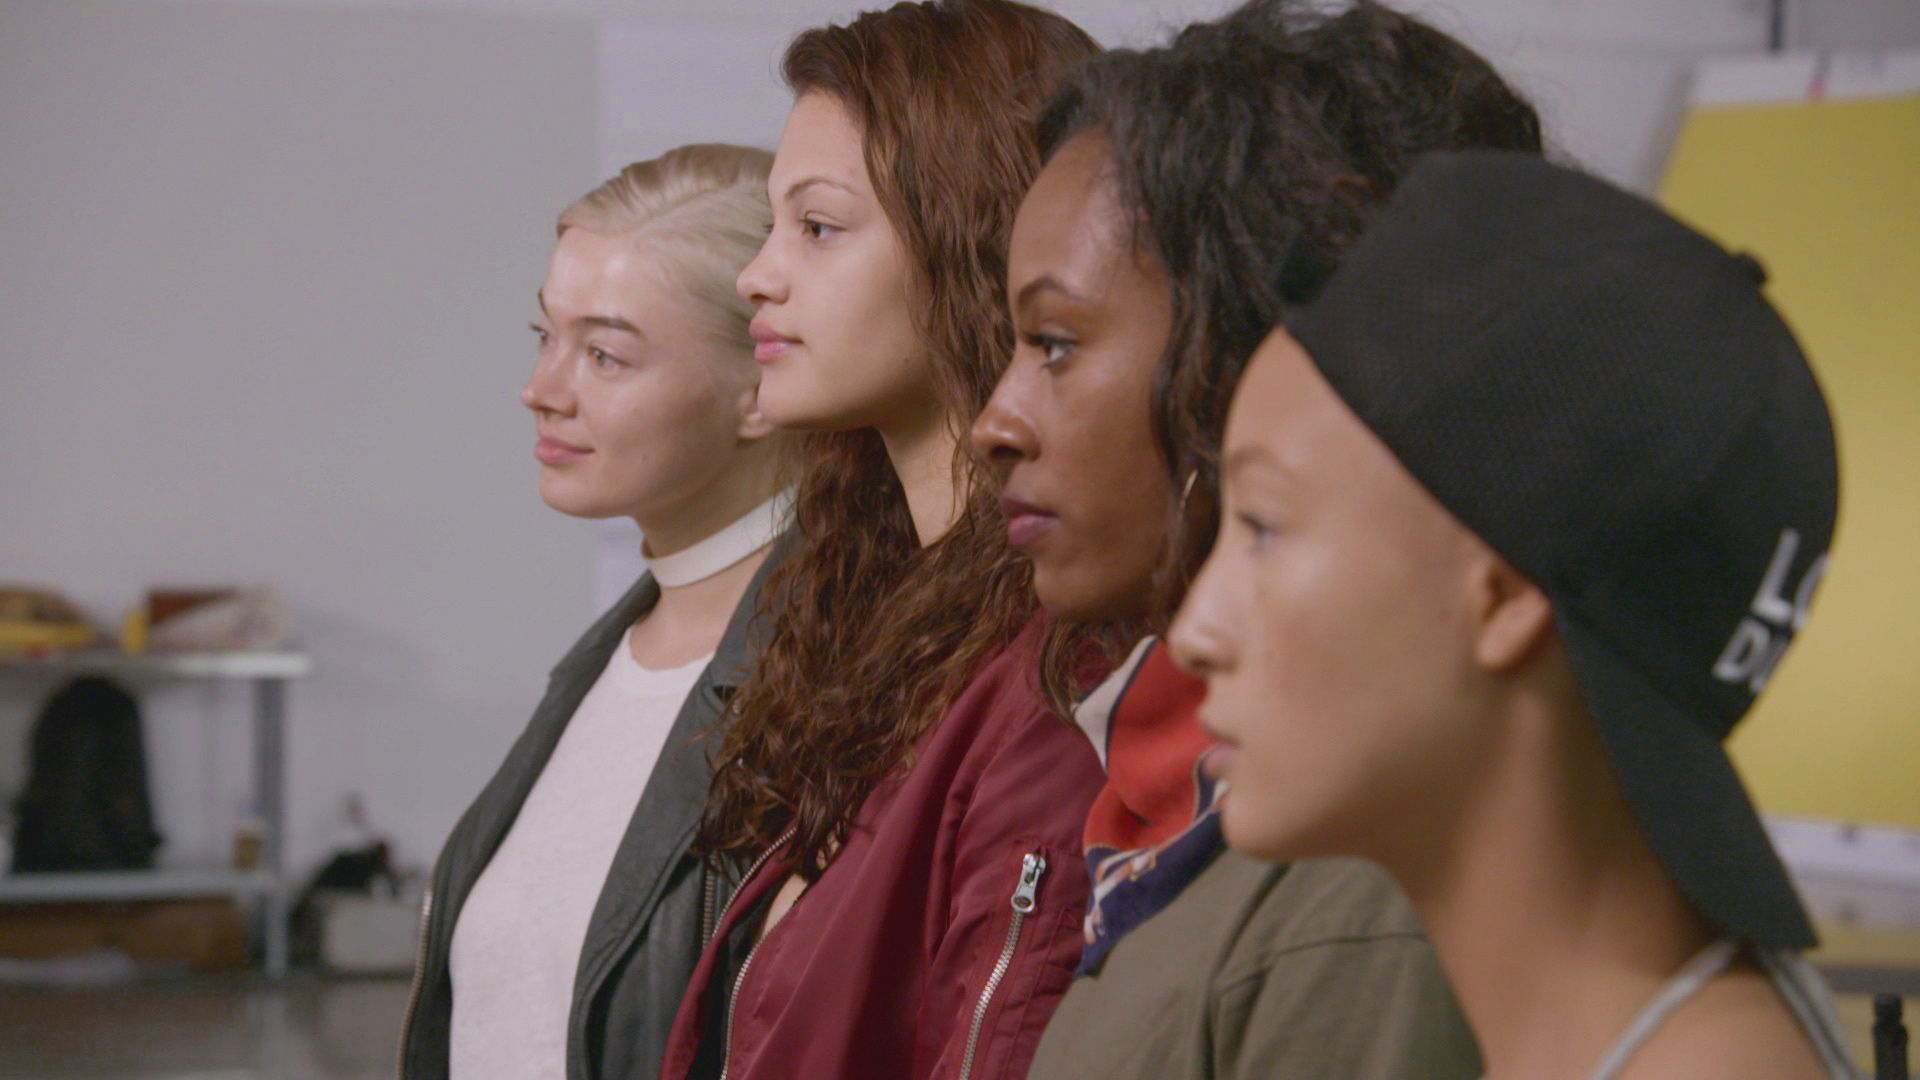 americas next top model season 24 episode 13 123movies